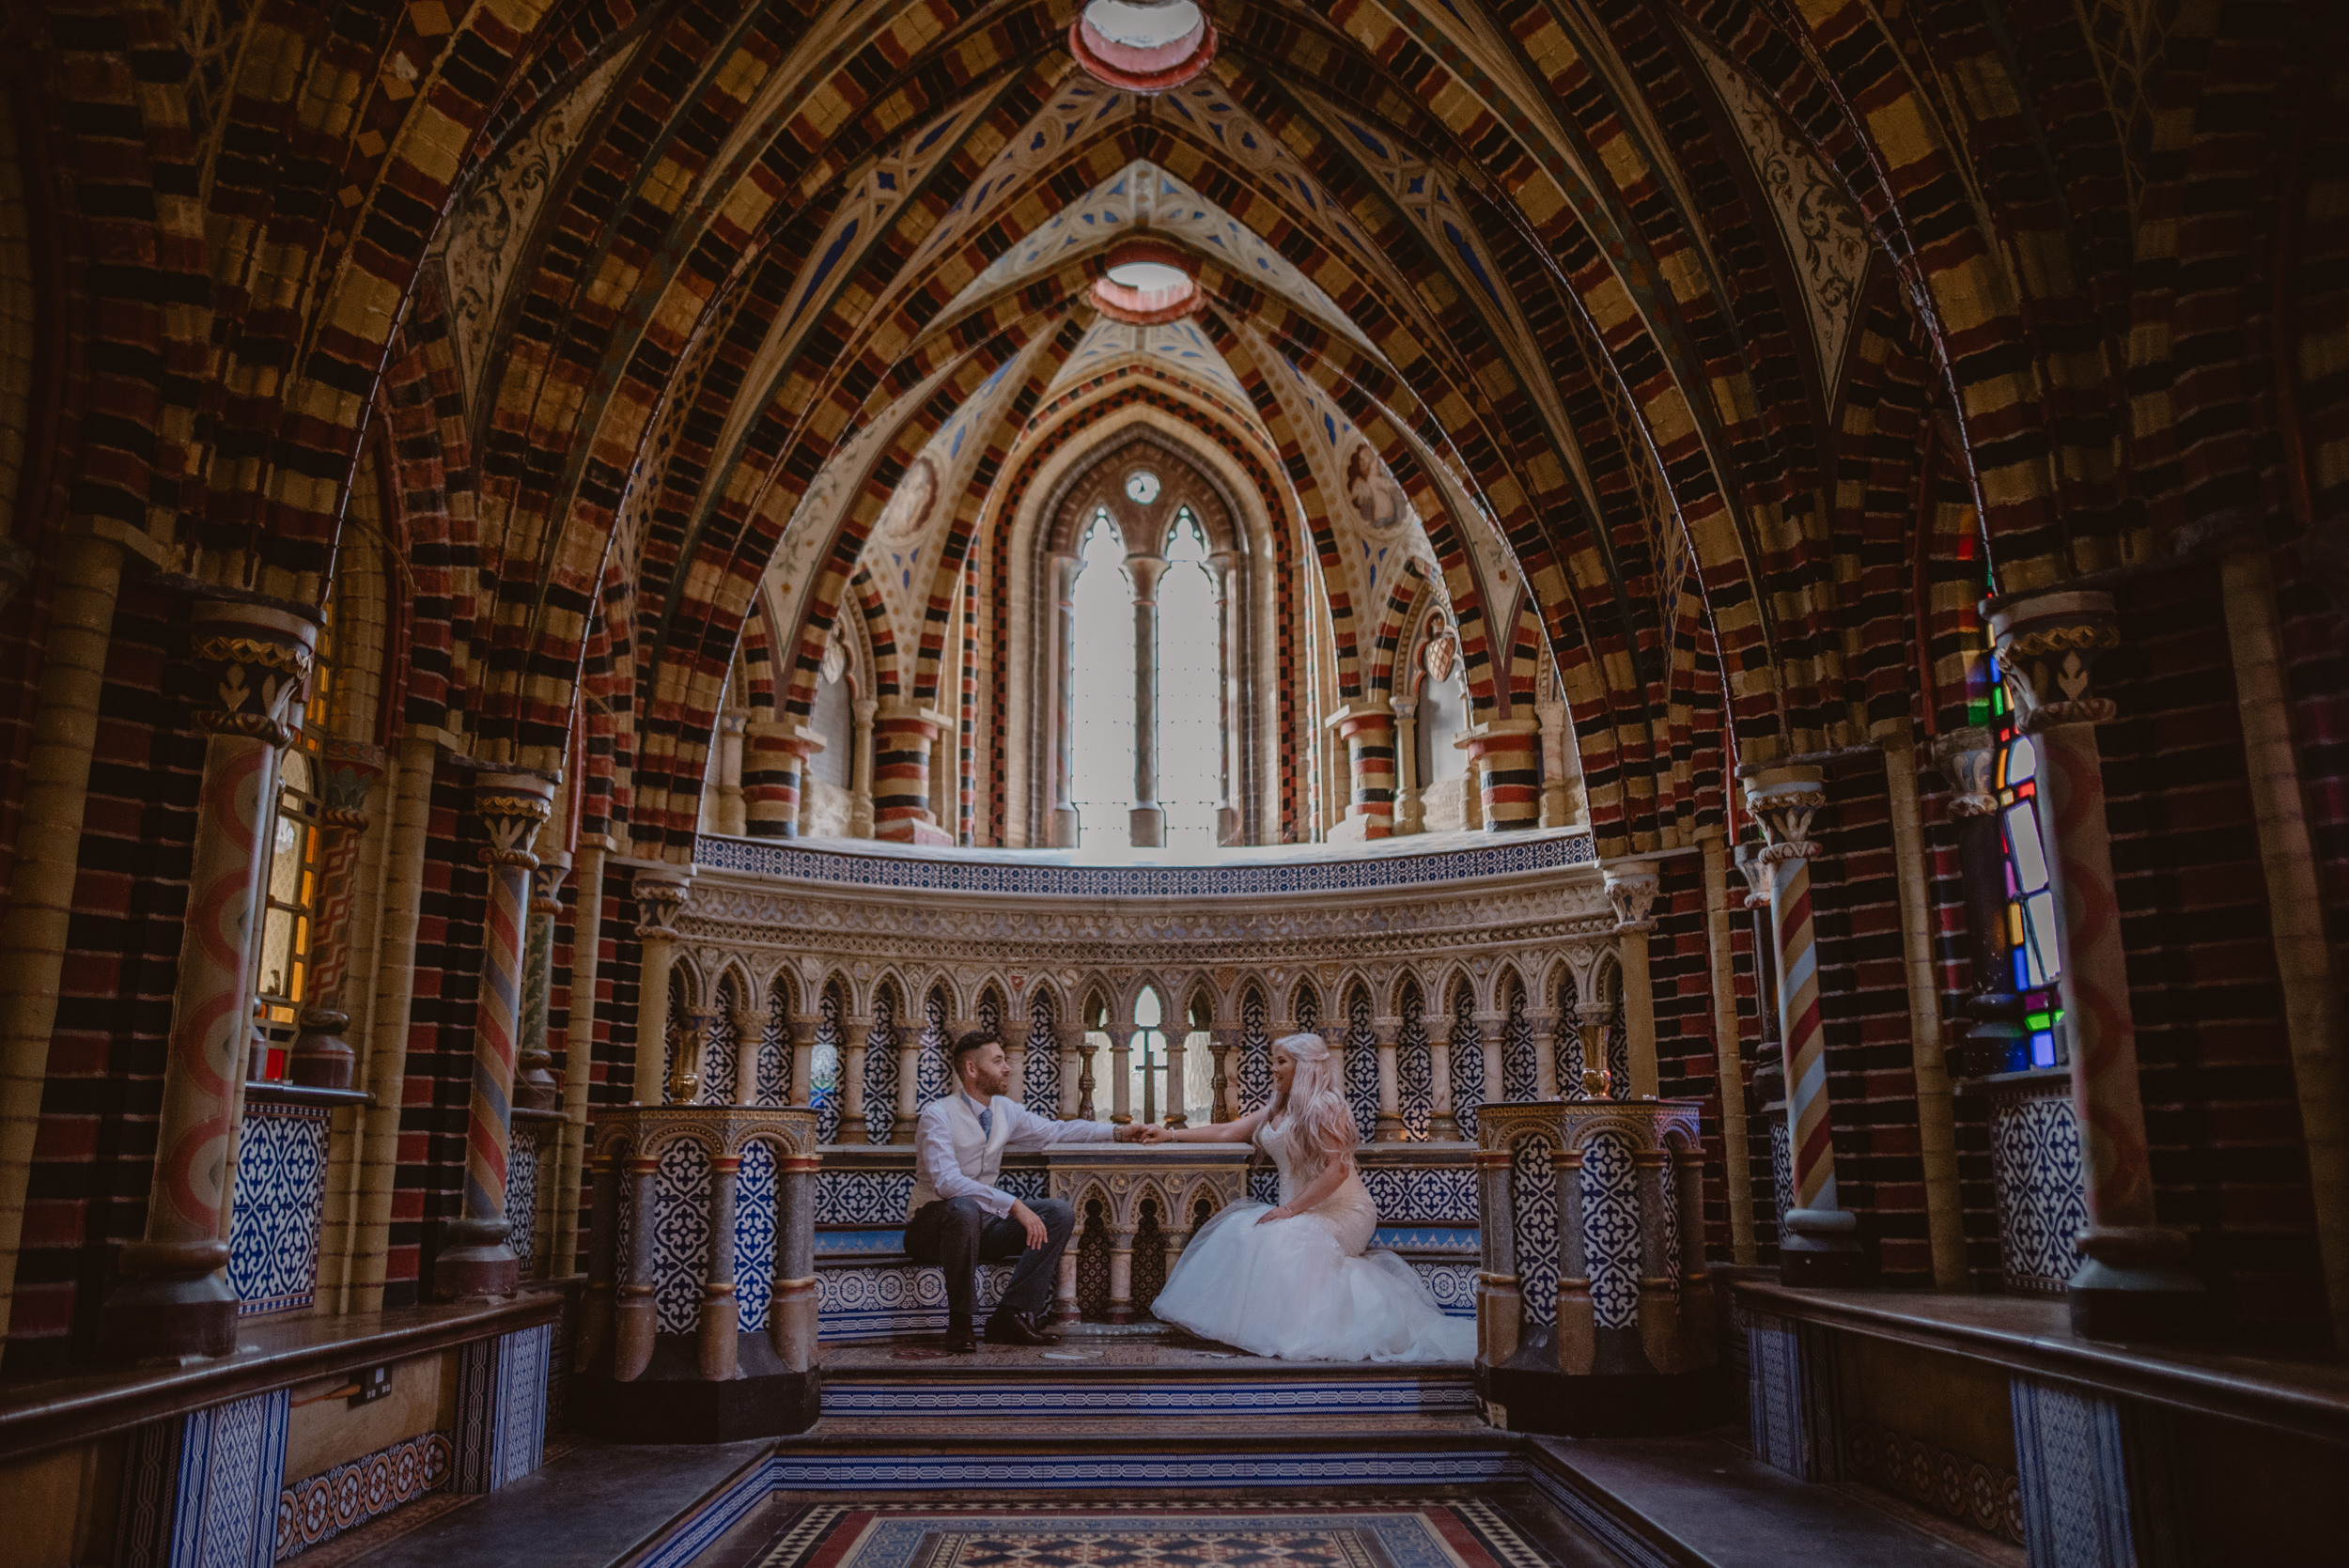 Rachel-and-James-Wedding-Horsley-Towers-State-Manu-Mendoza-Wedding-Photography-465.jpg